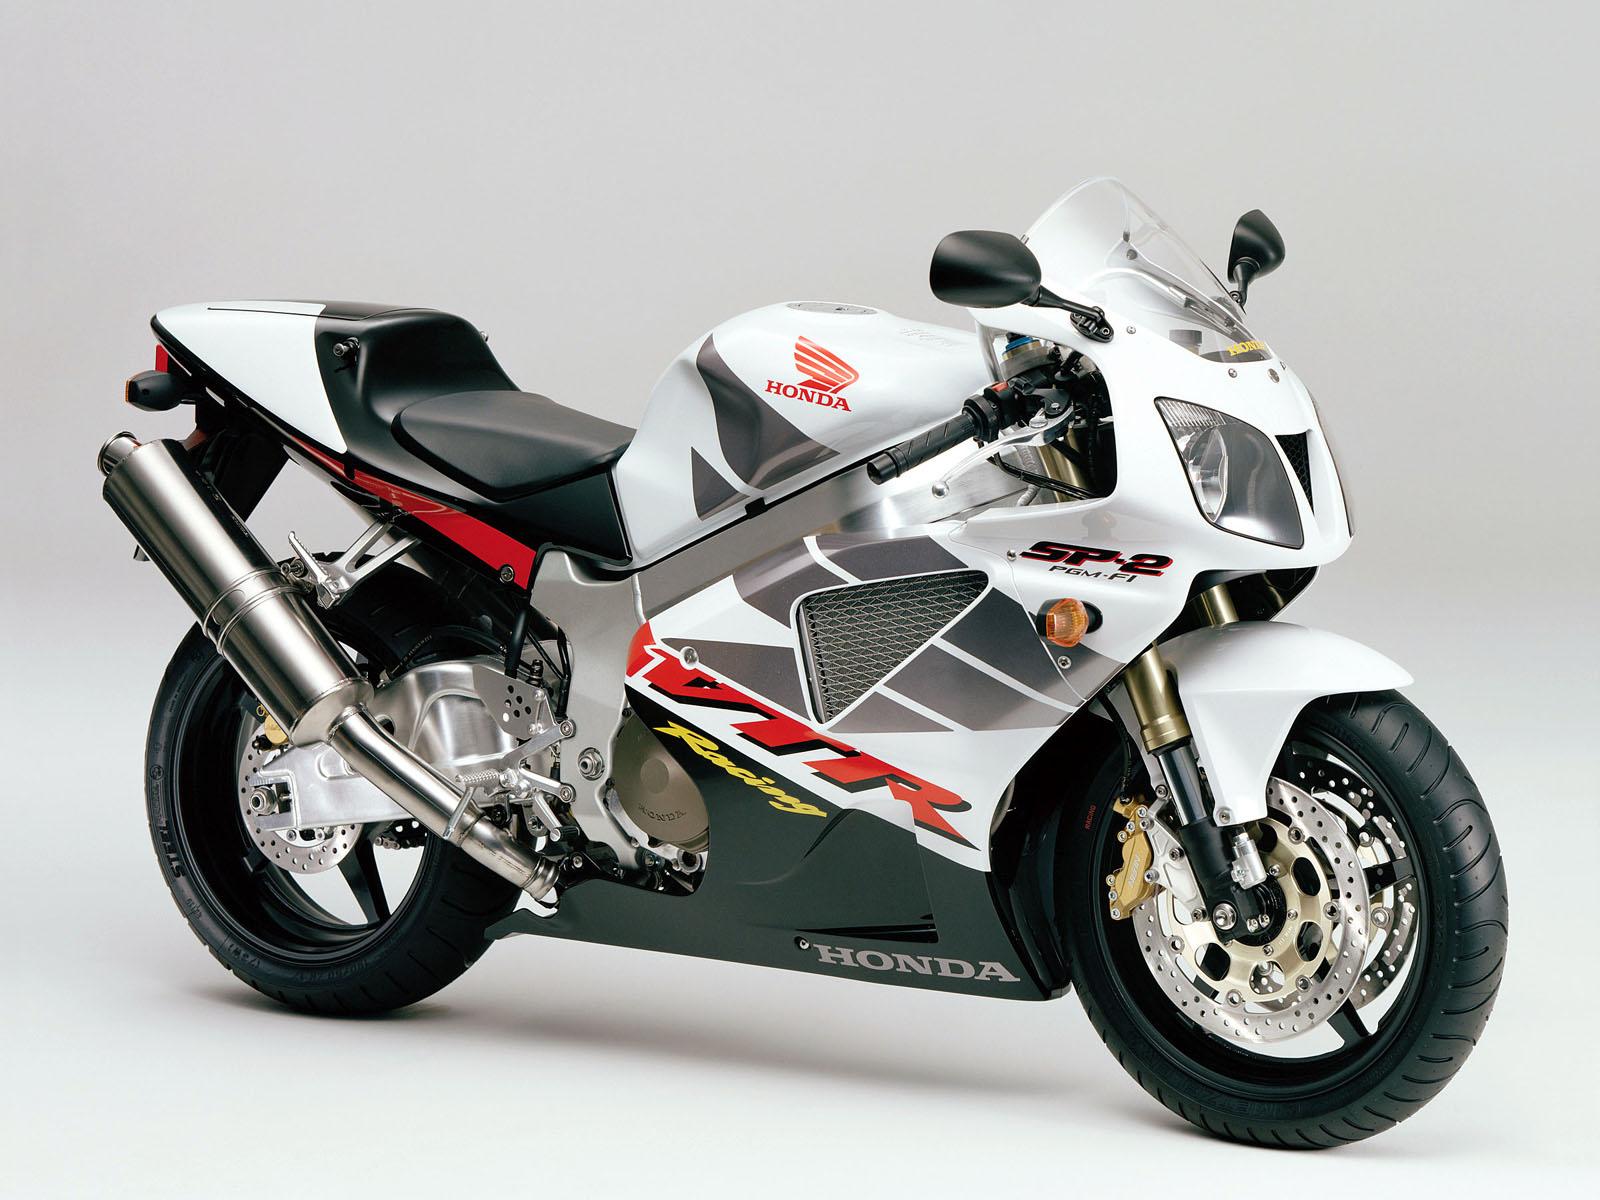 http://2.bp.blogspot.com/_Kpi0thIqeJI/TQYIu_07oOI/AAAAAAAAAW0/lWX-LX8d_E8/s1600/Motocycles_Honda__003717_.jpg